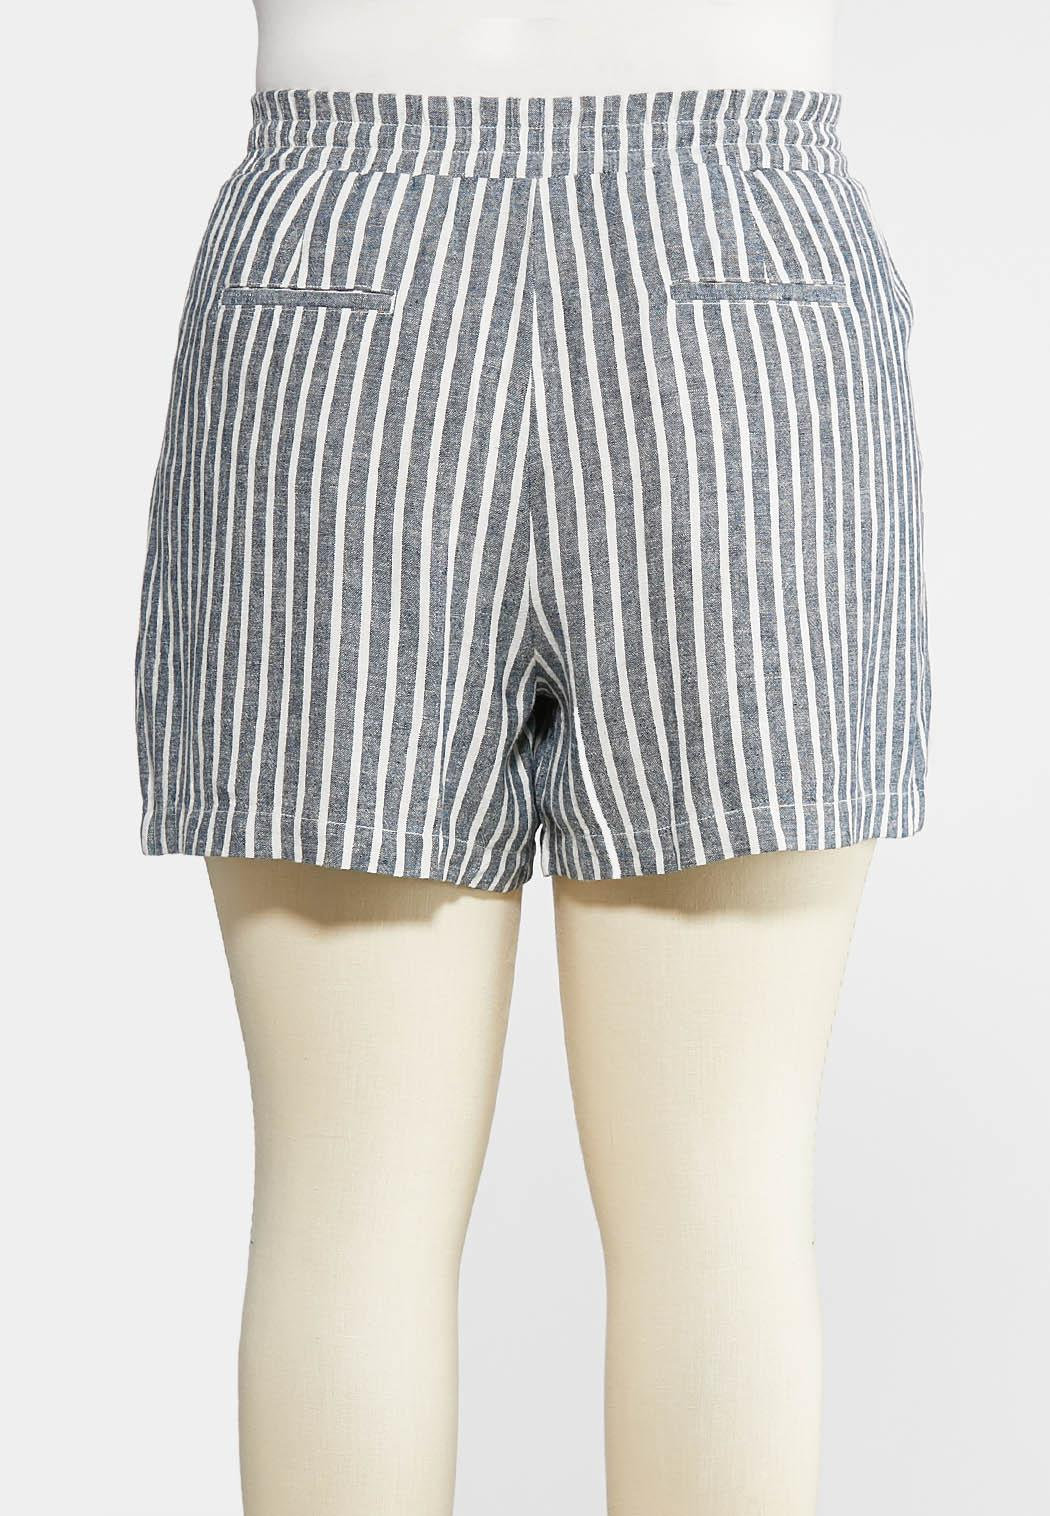 5ff3a52a264 Plus Size Nautical Stripe Linen Shorts Shorts Cato Fashions